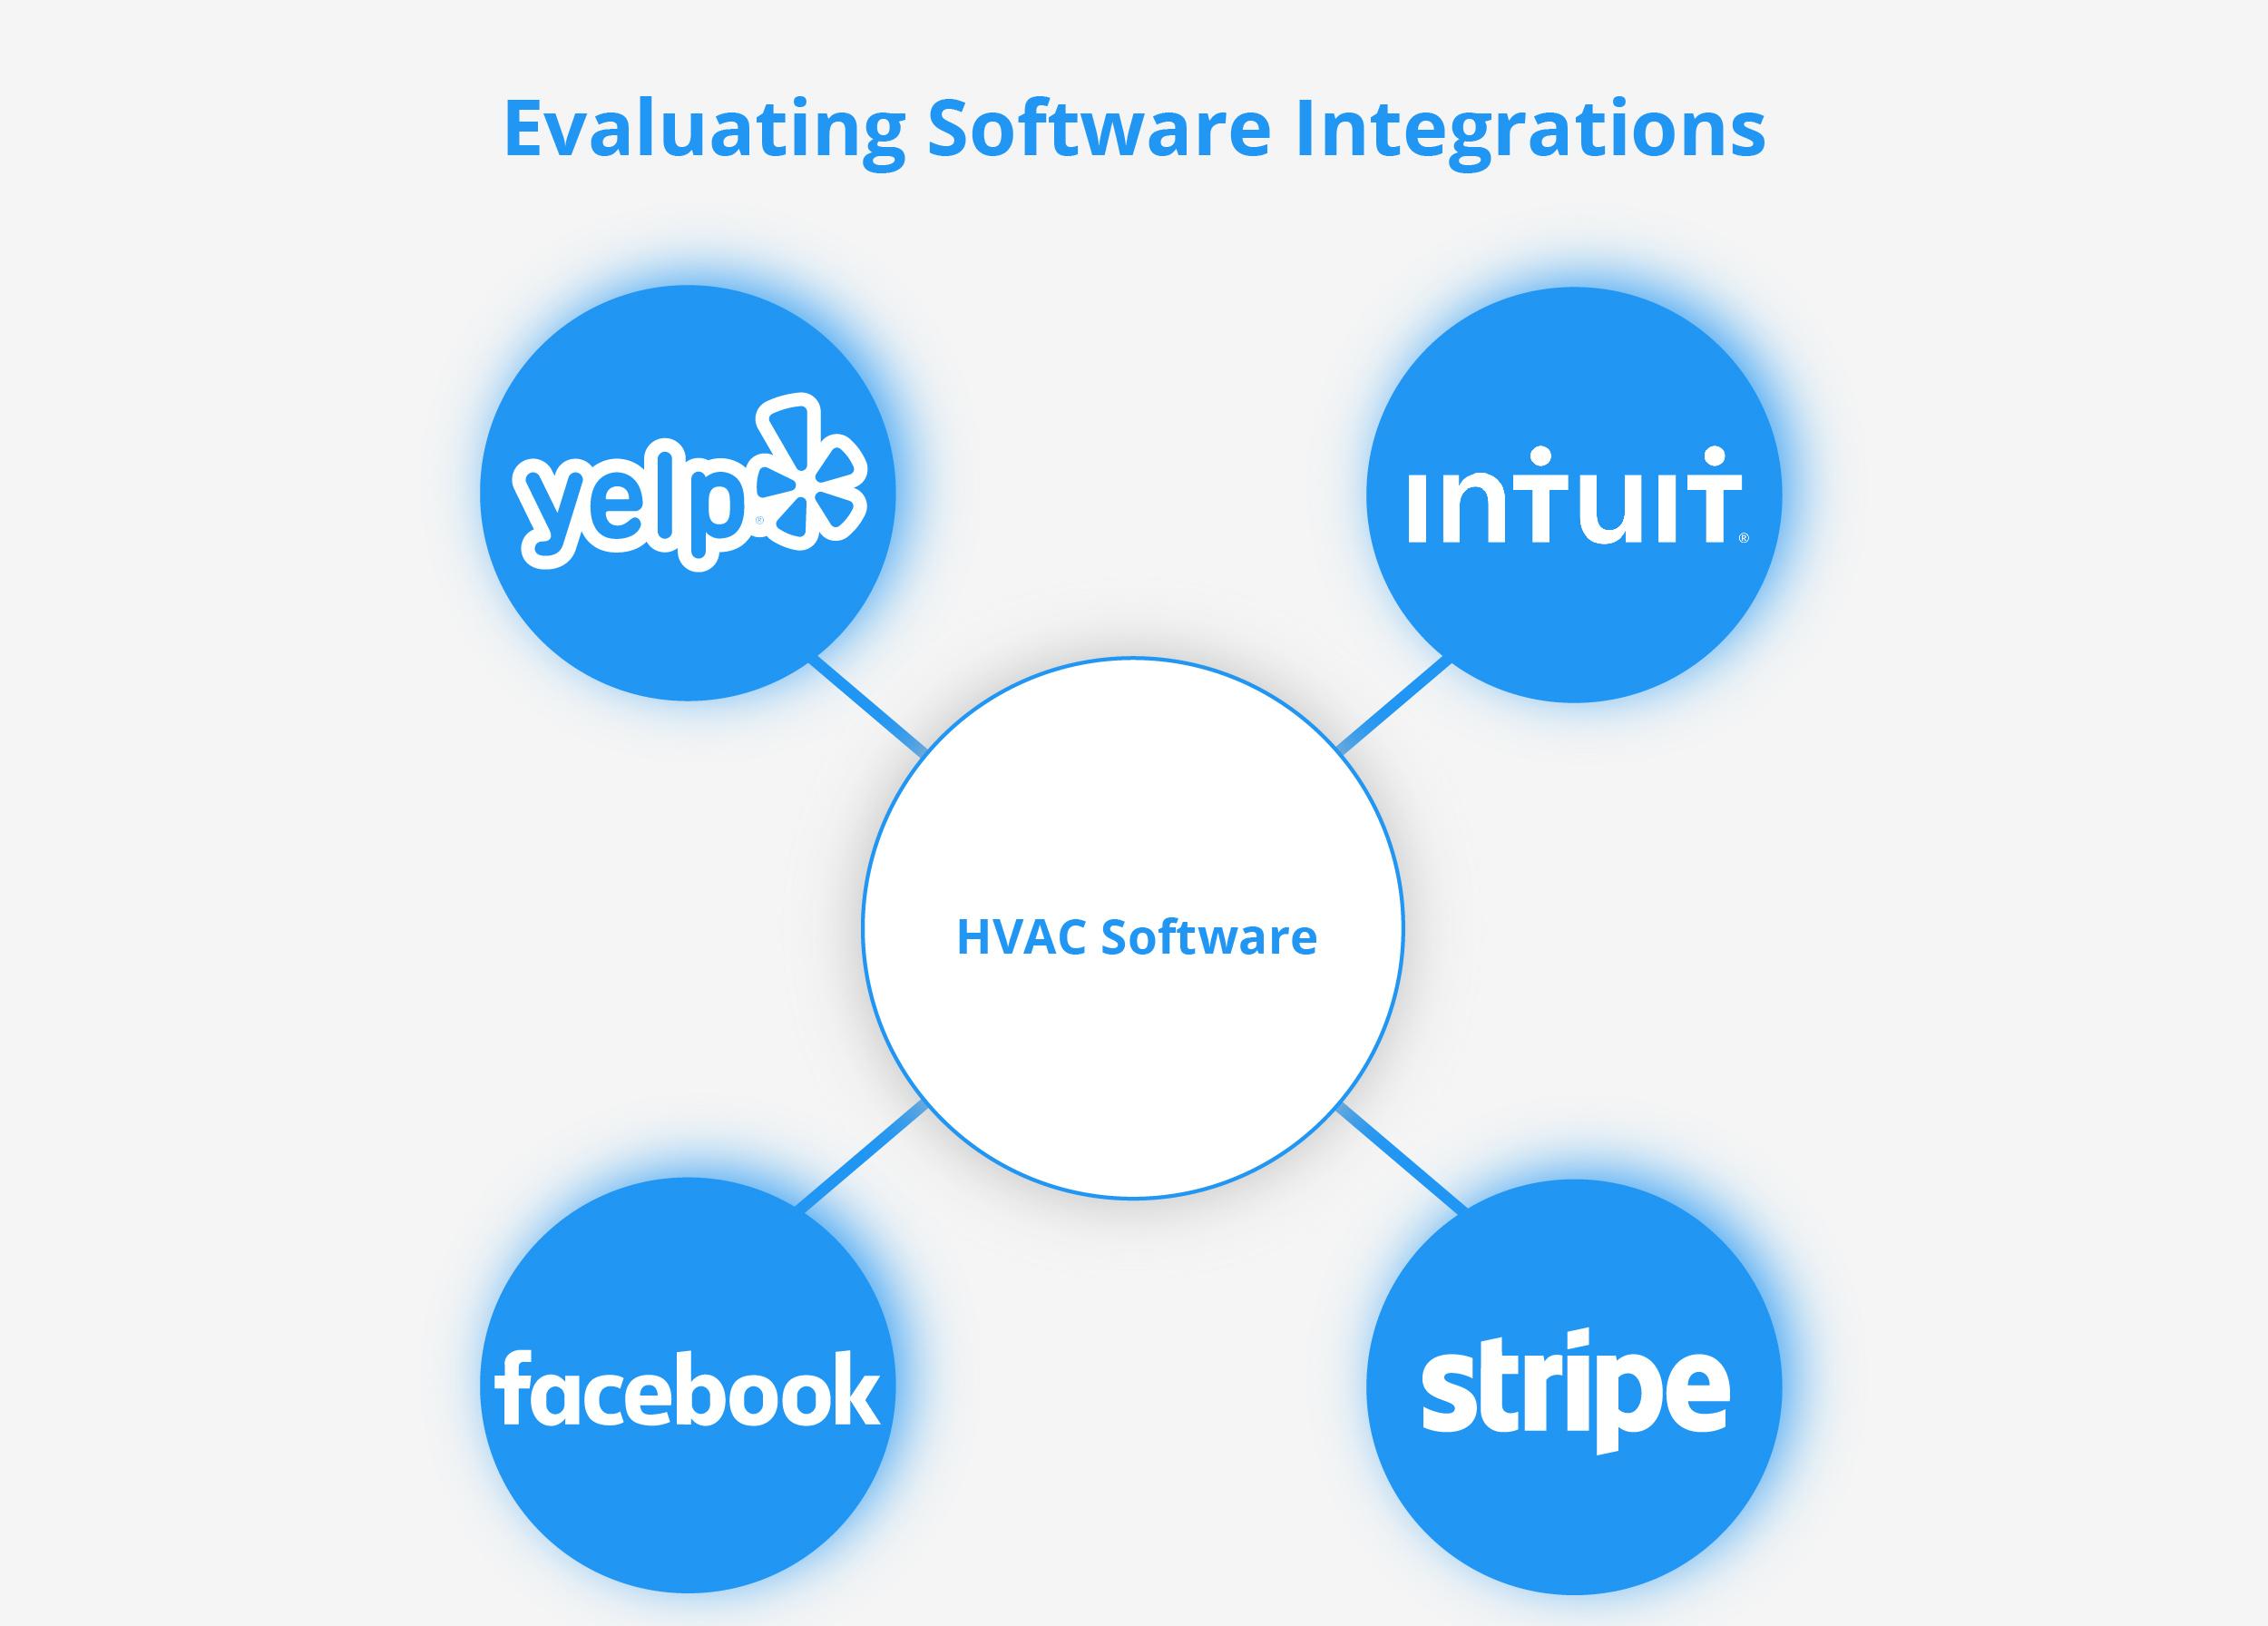 HVAC Software integrations